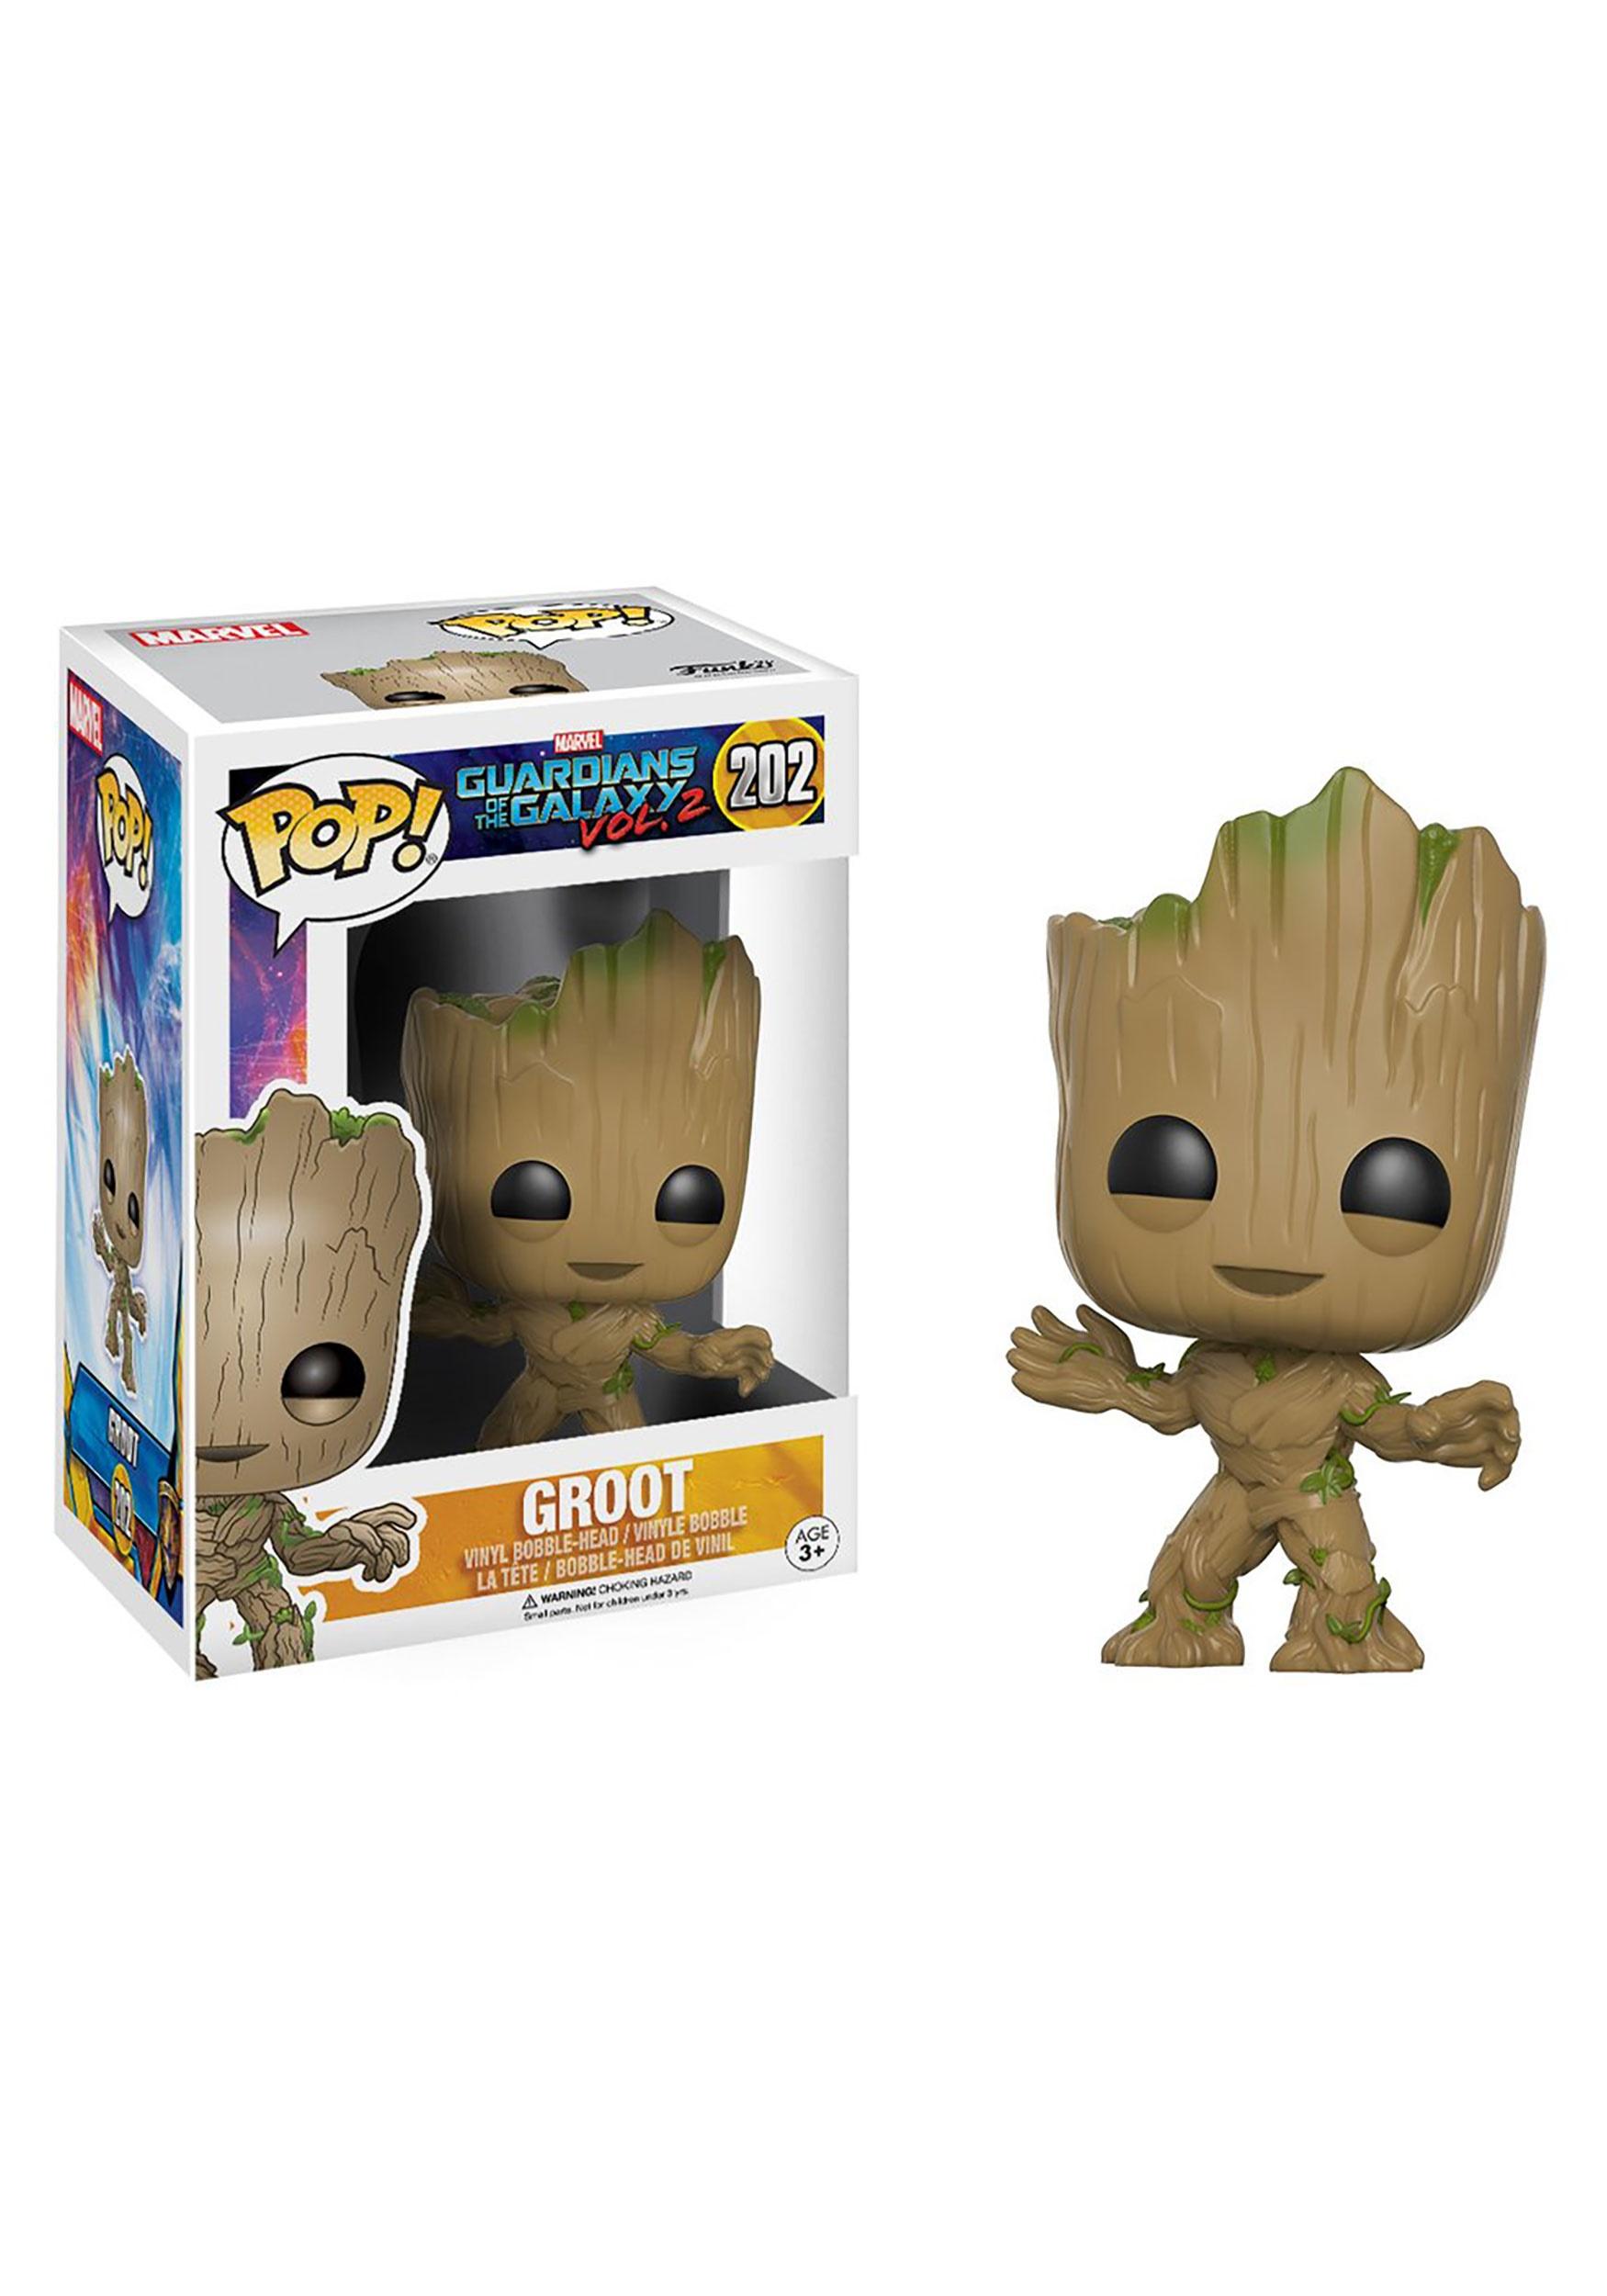 POP Guardians 2 Groot Bobblehead Figure FN13230